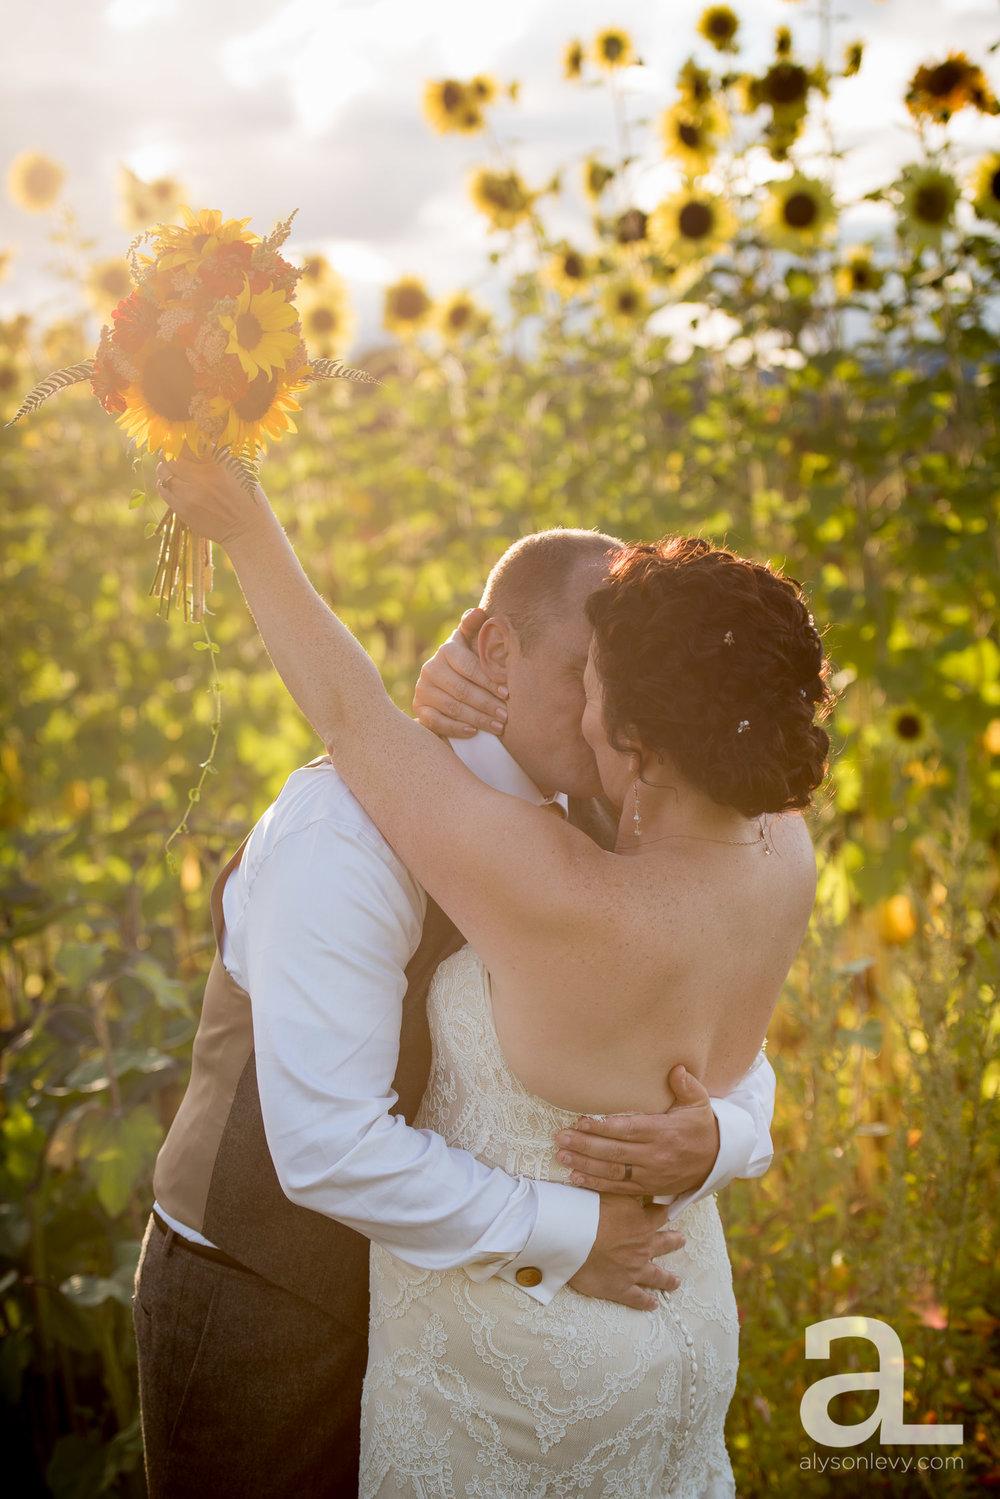 Krugers-Farm-Sauvie-Island-Wedding-Photography-021.jpg